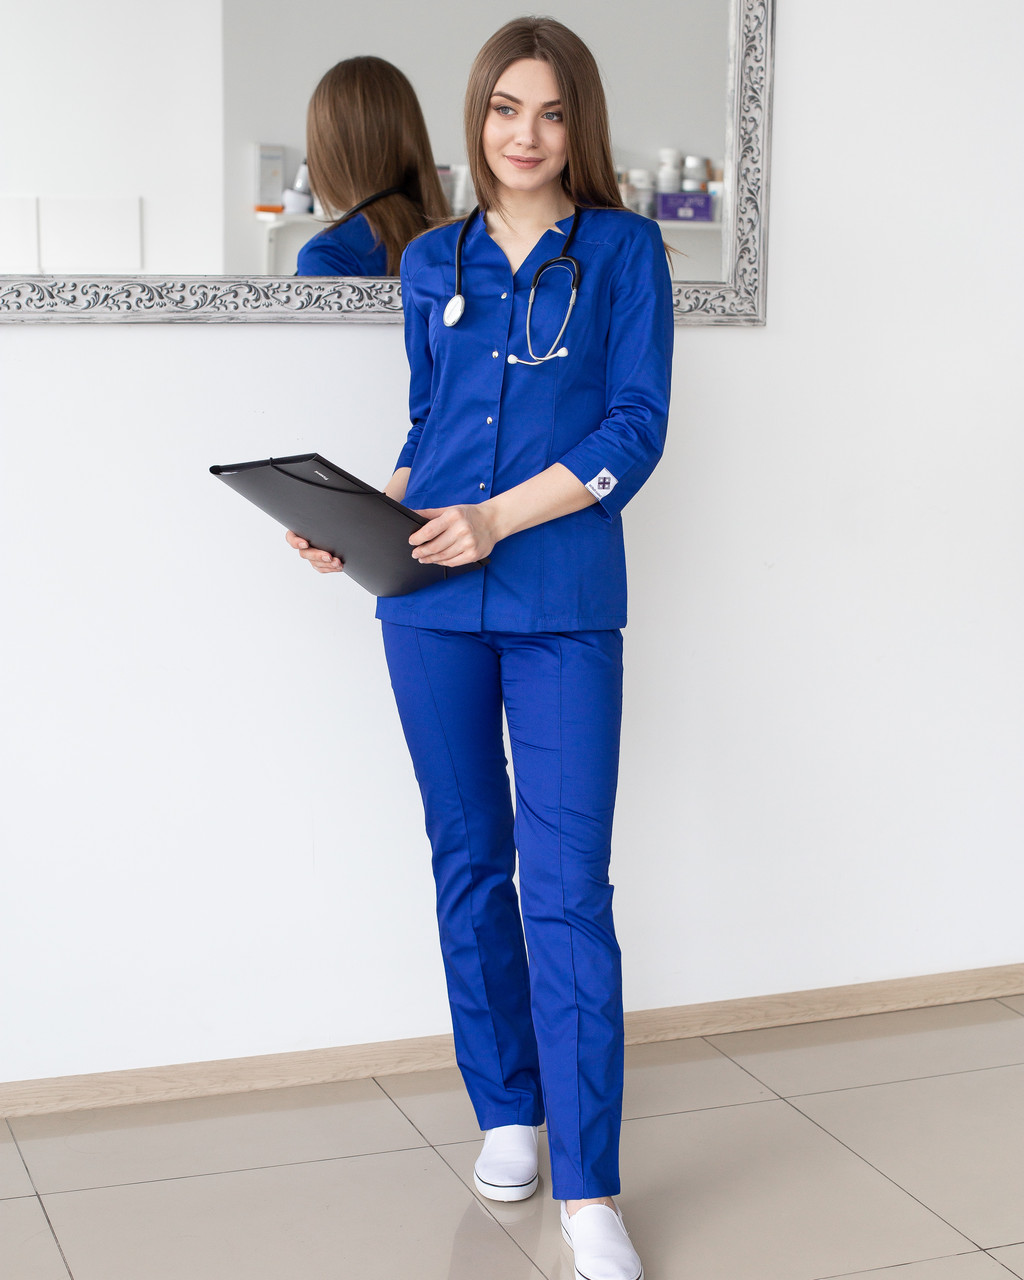 Медицинский женский костюм Лотос электрик